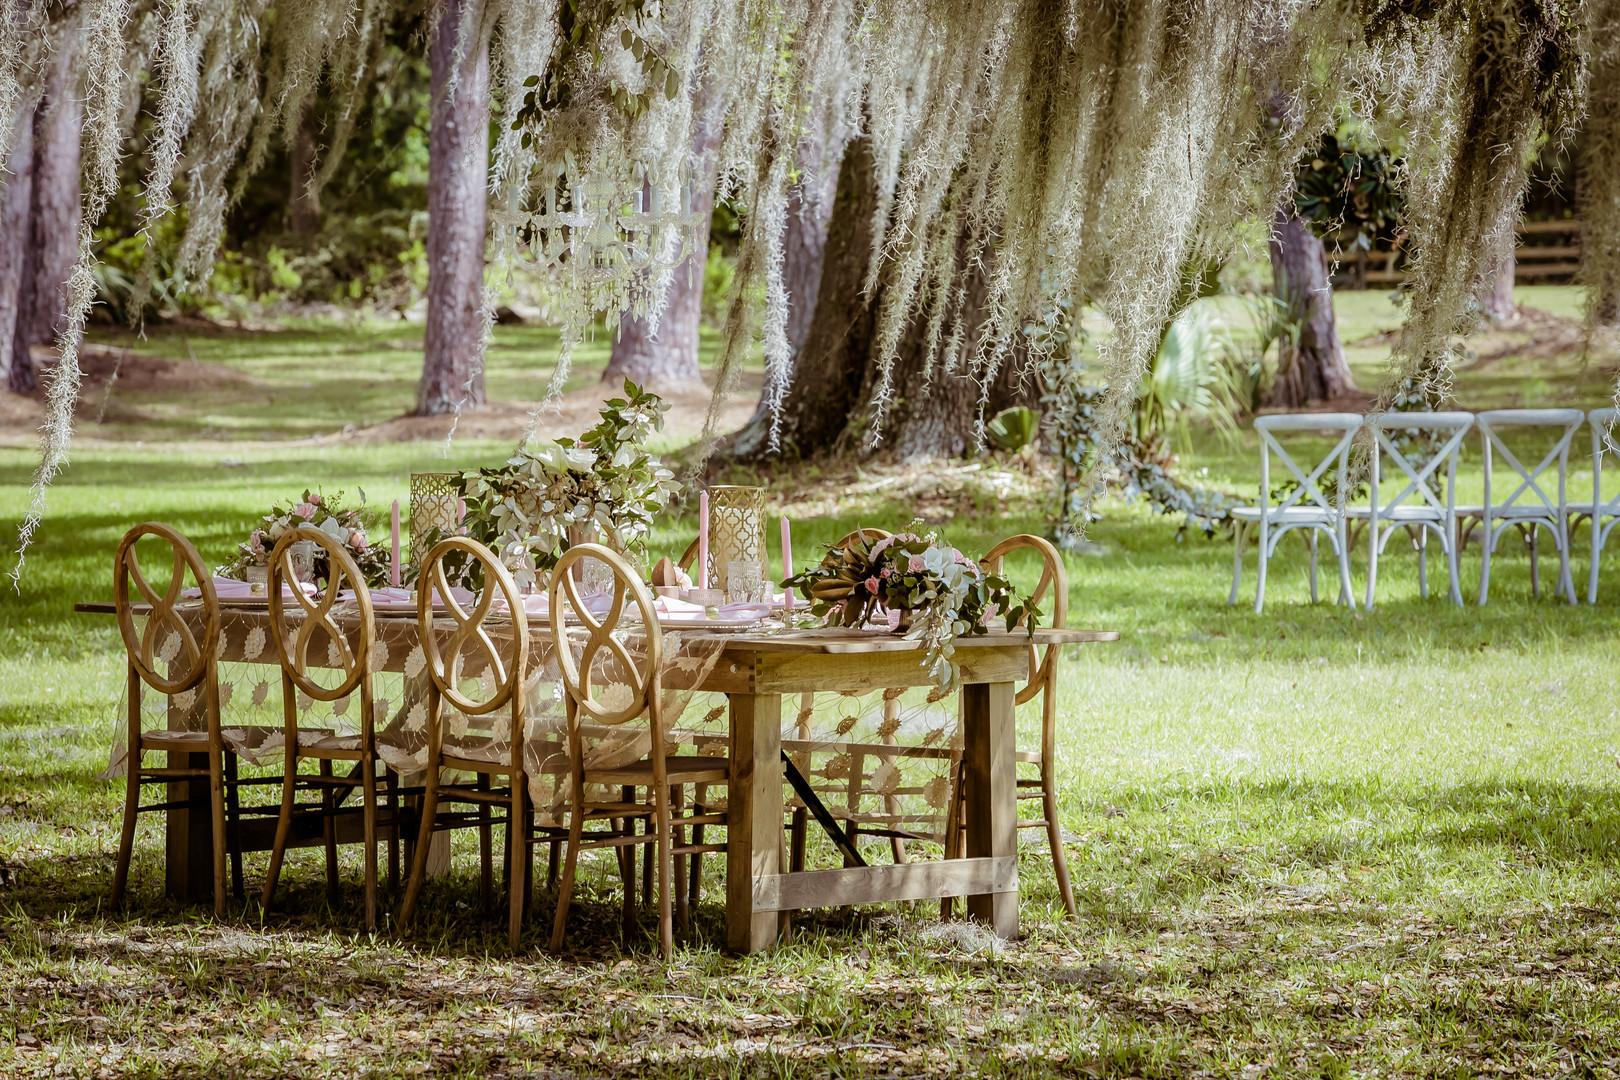 rose-hill-mansion-wedding-13.jpg